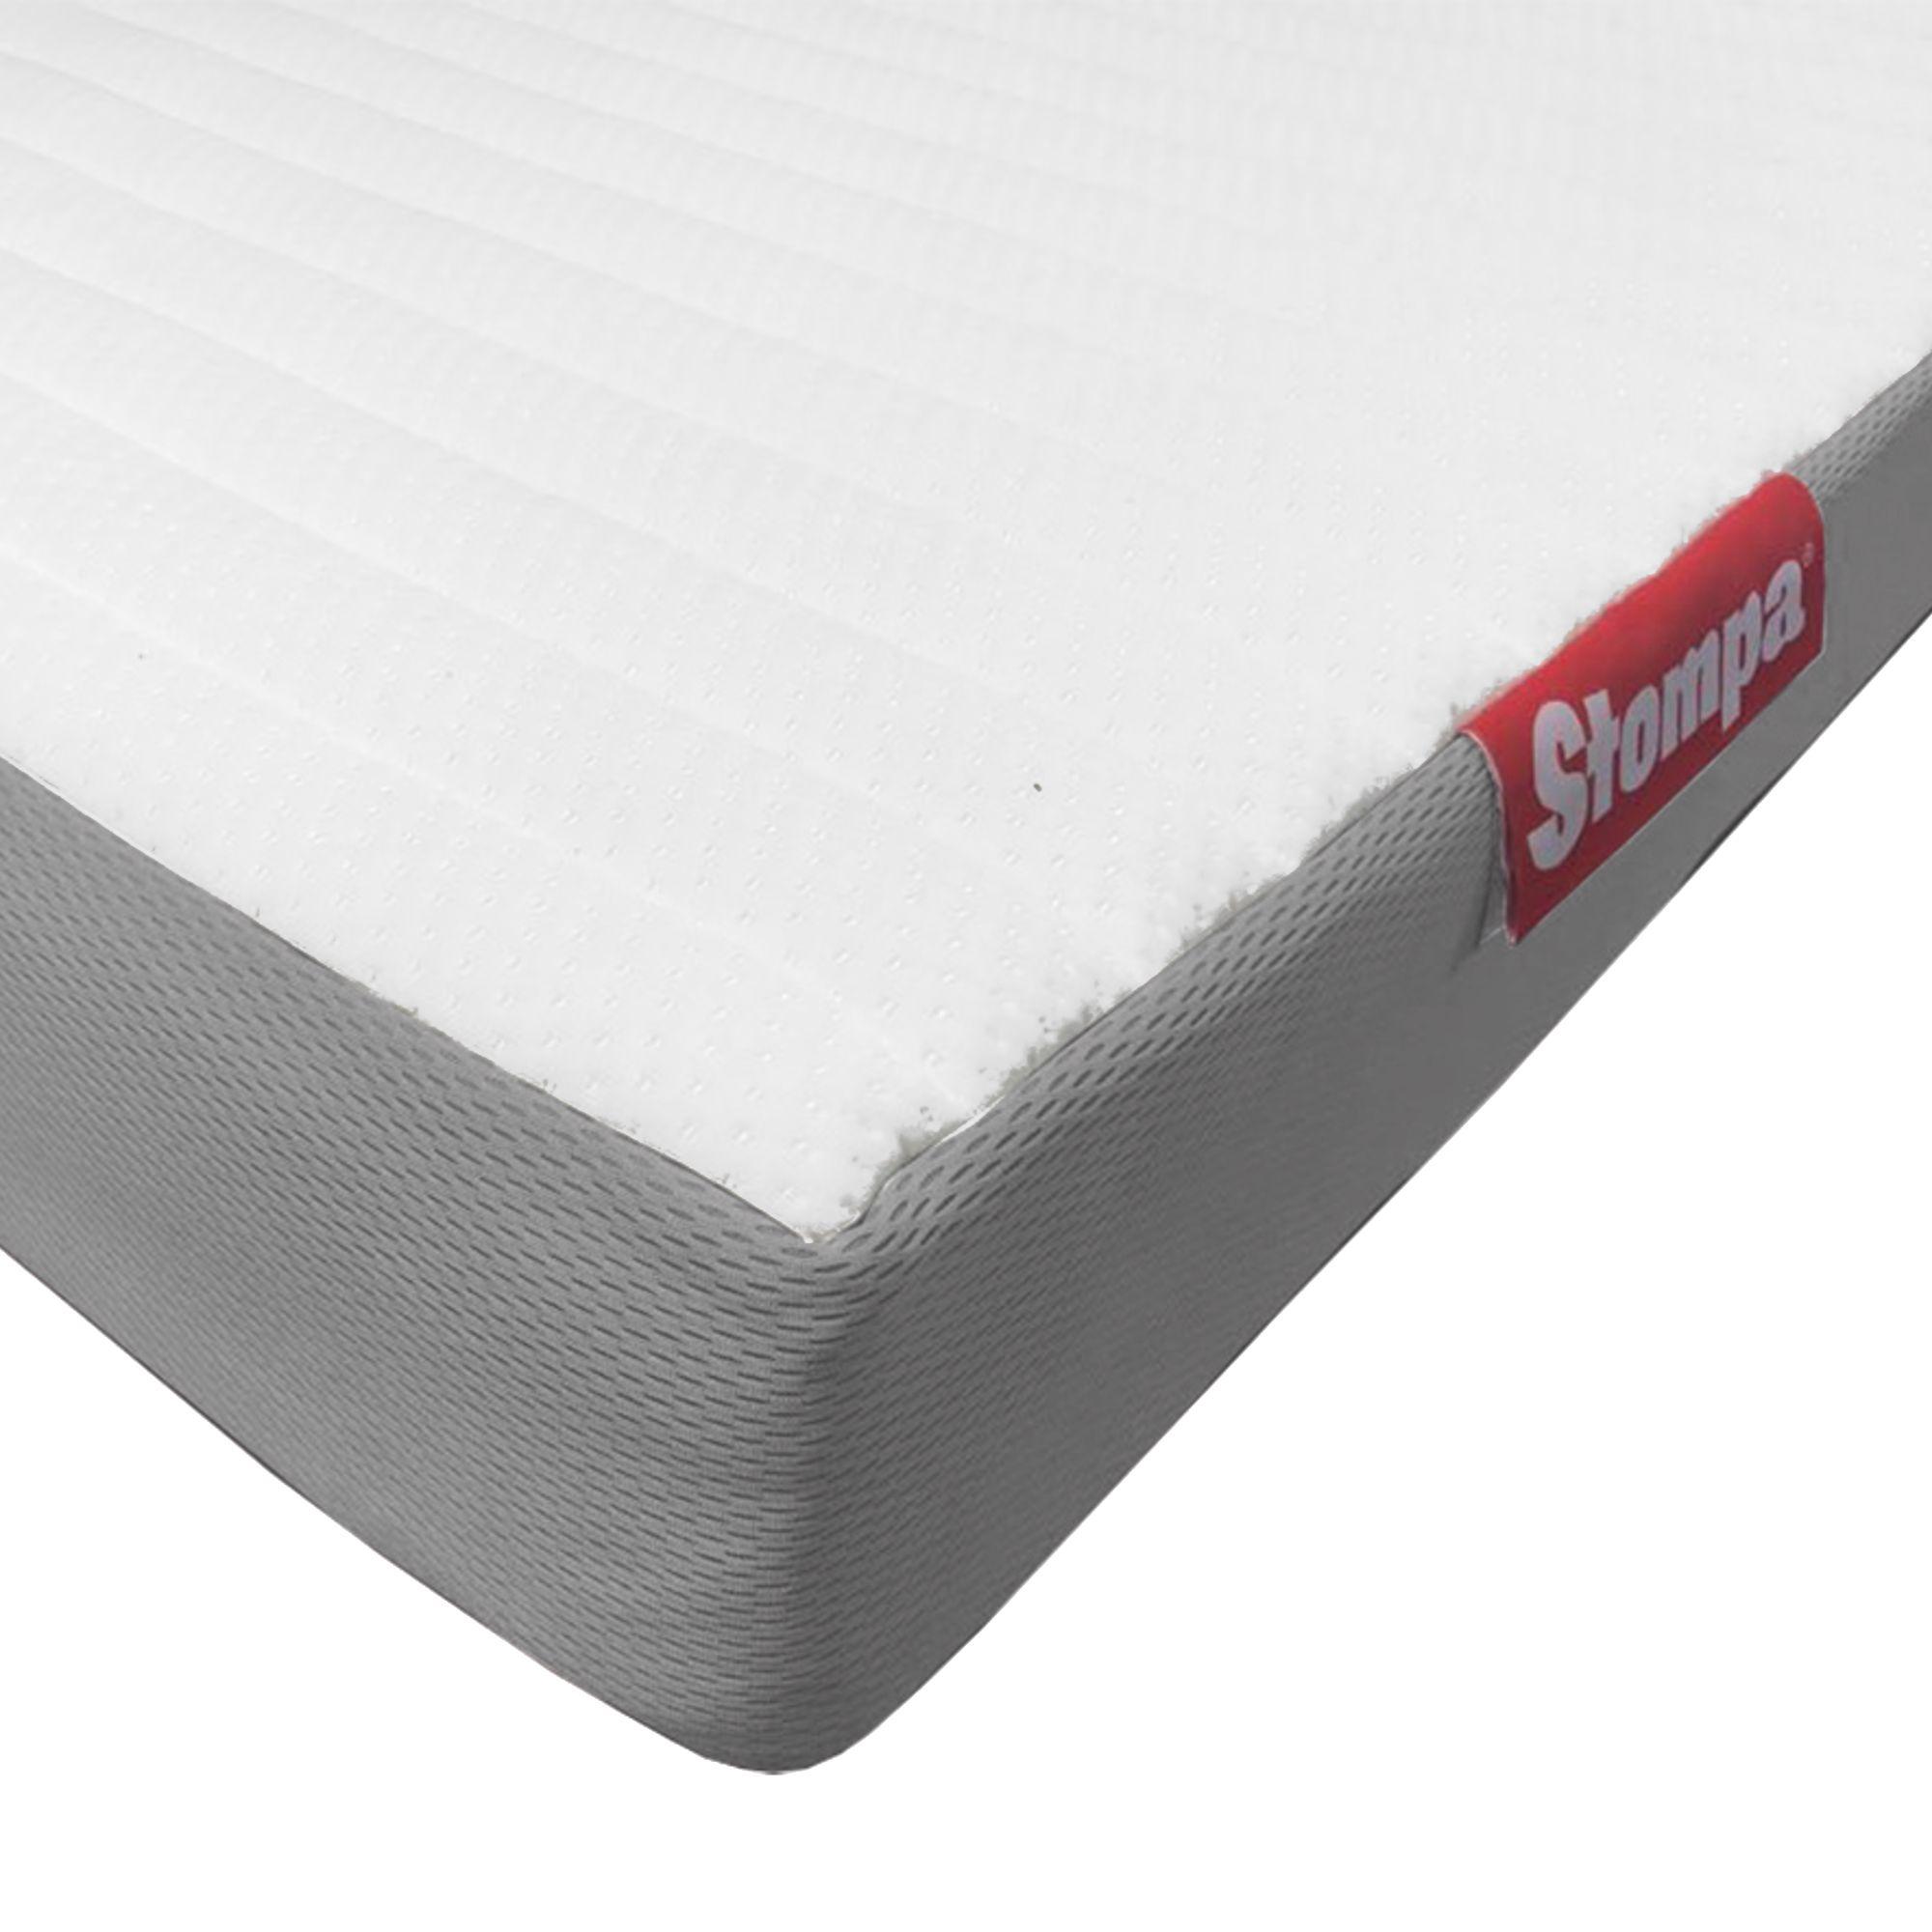 Stompa Stompa S Flex Airflow Pocket Spring Mattress, Medium, Extra Long Single